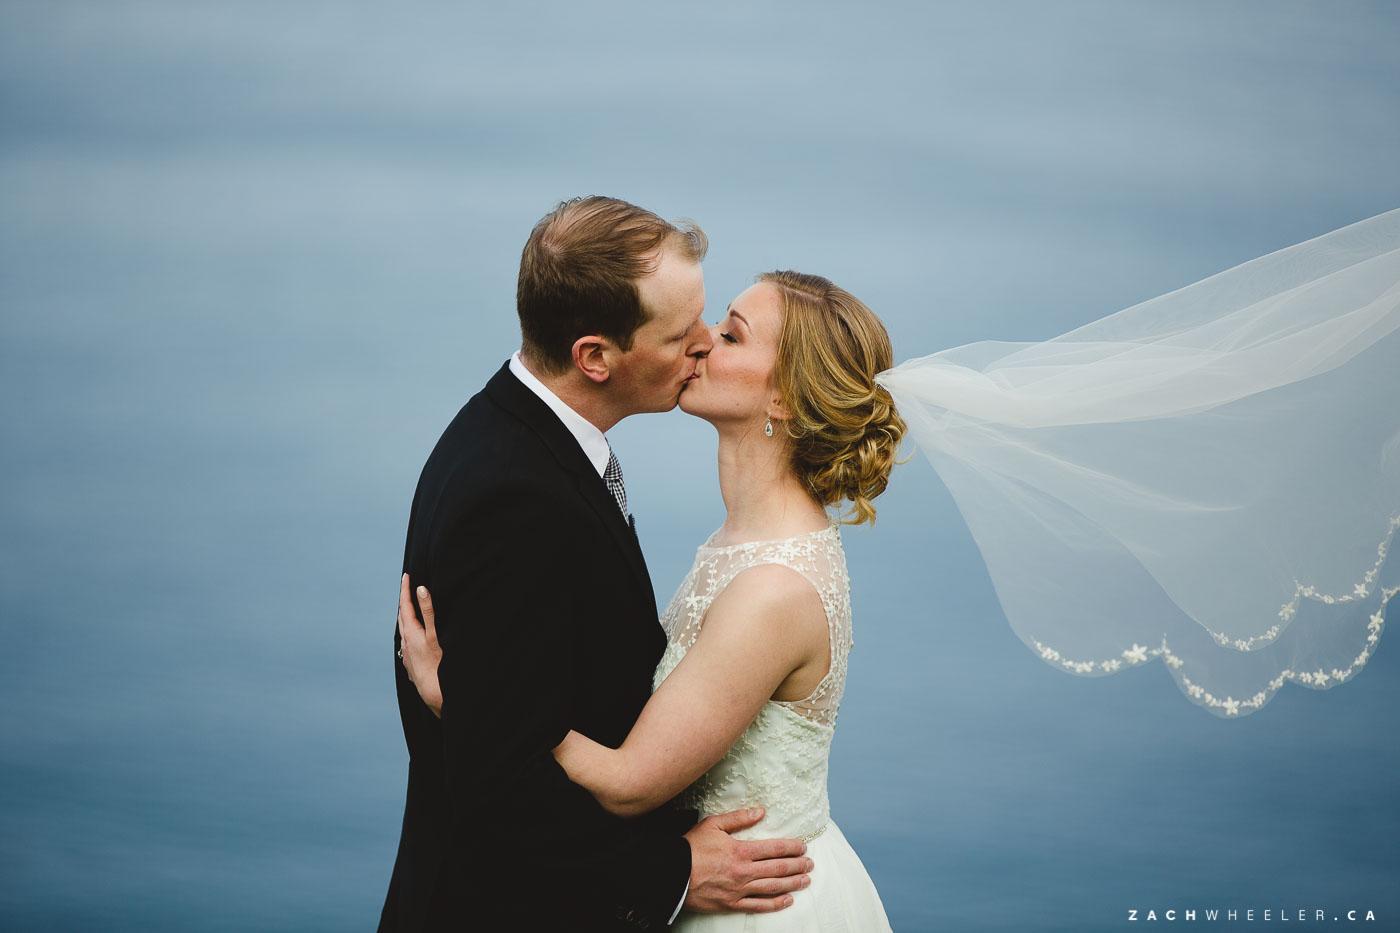 Sarah-Grant-Lesters-Fram-Wedding-66